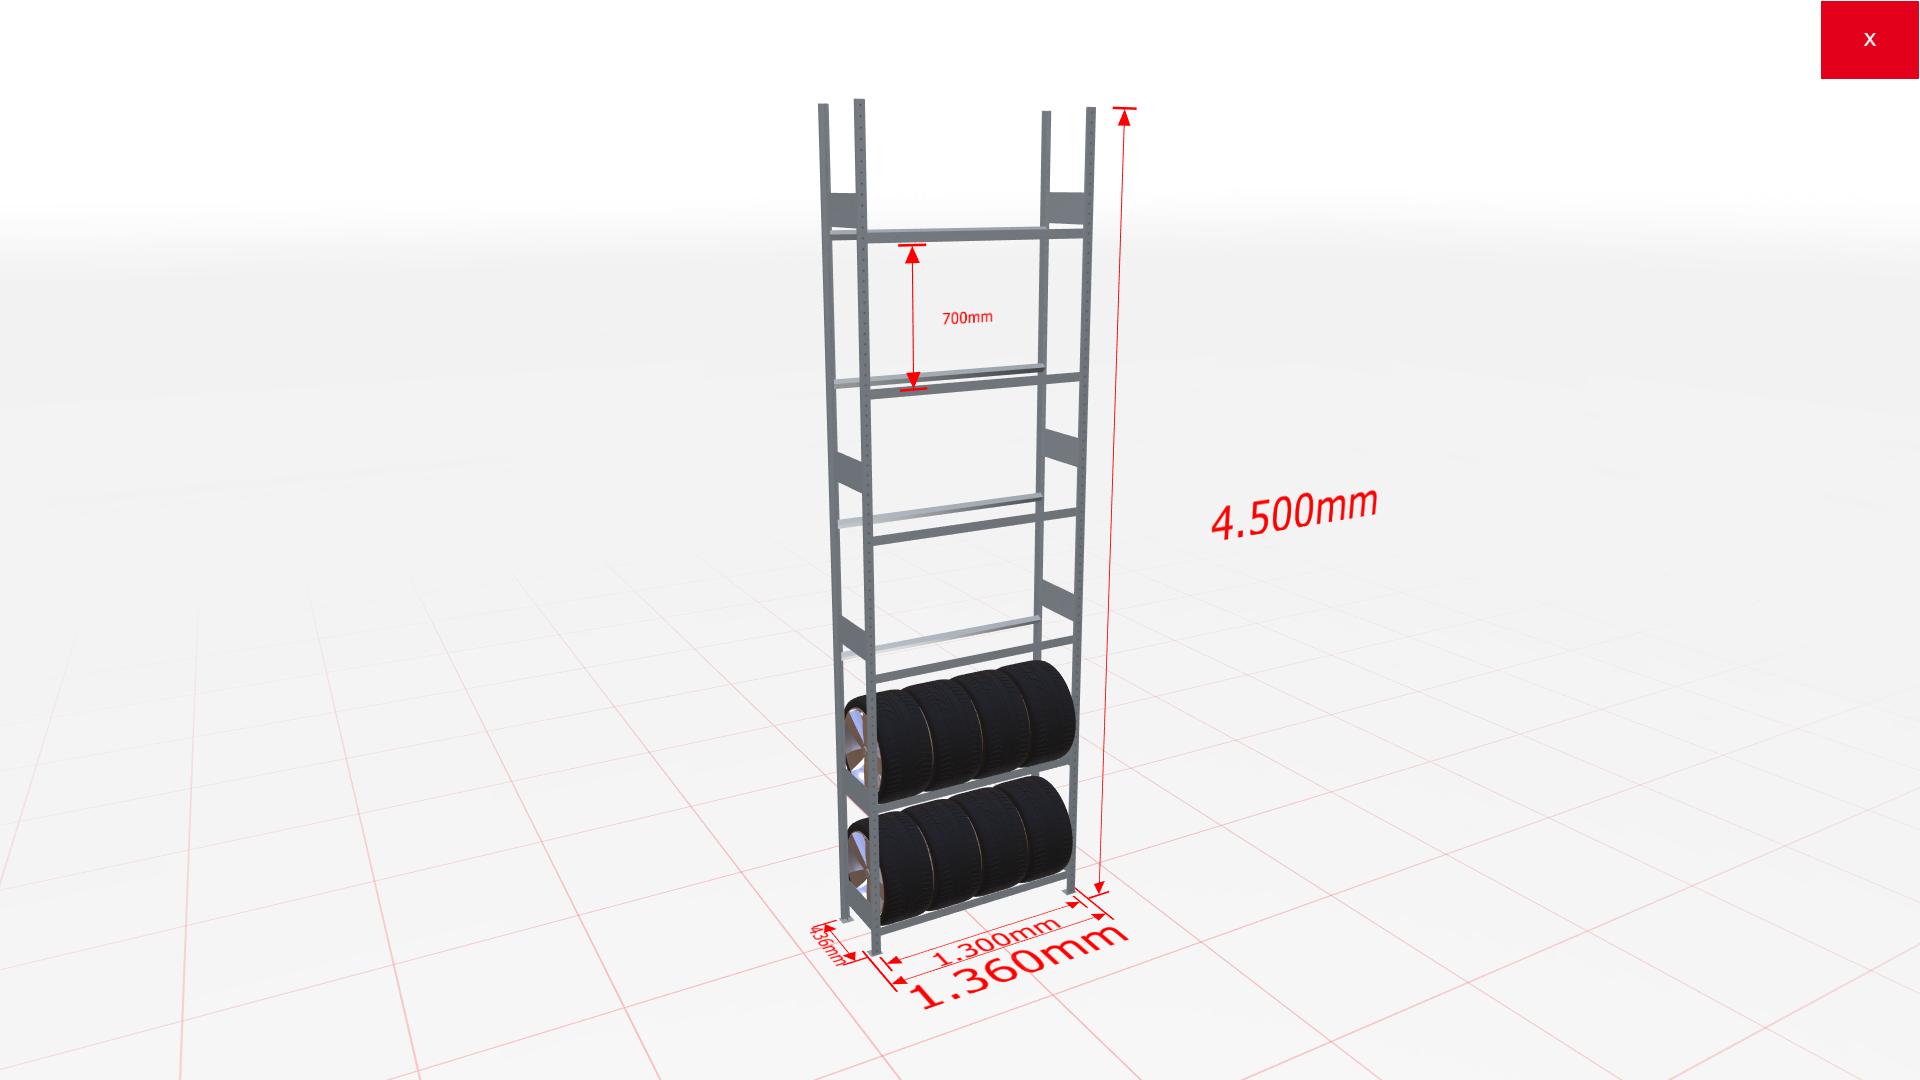 Räderregal Grundregal SCHULTE Lagertechnik 4500x1300x400 mm – 6 Ebenen á 1300 mm, verzinkt